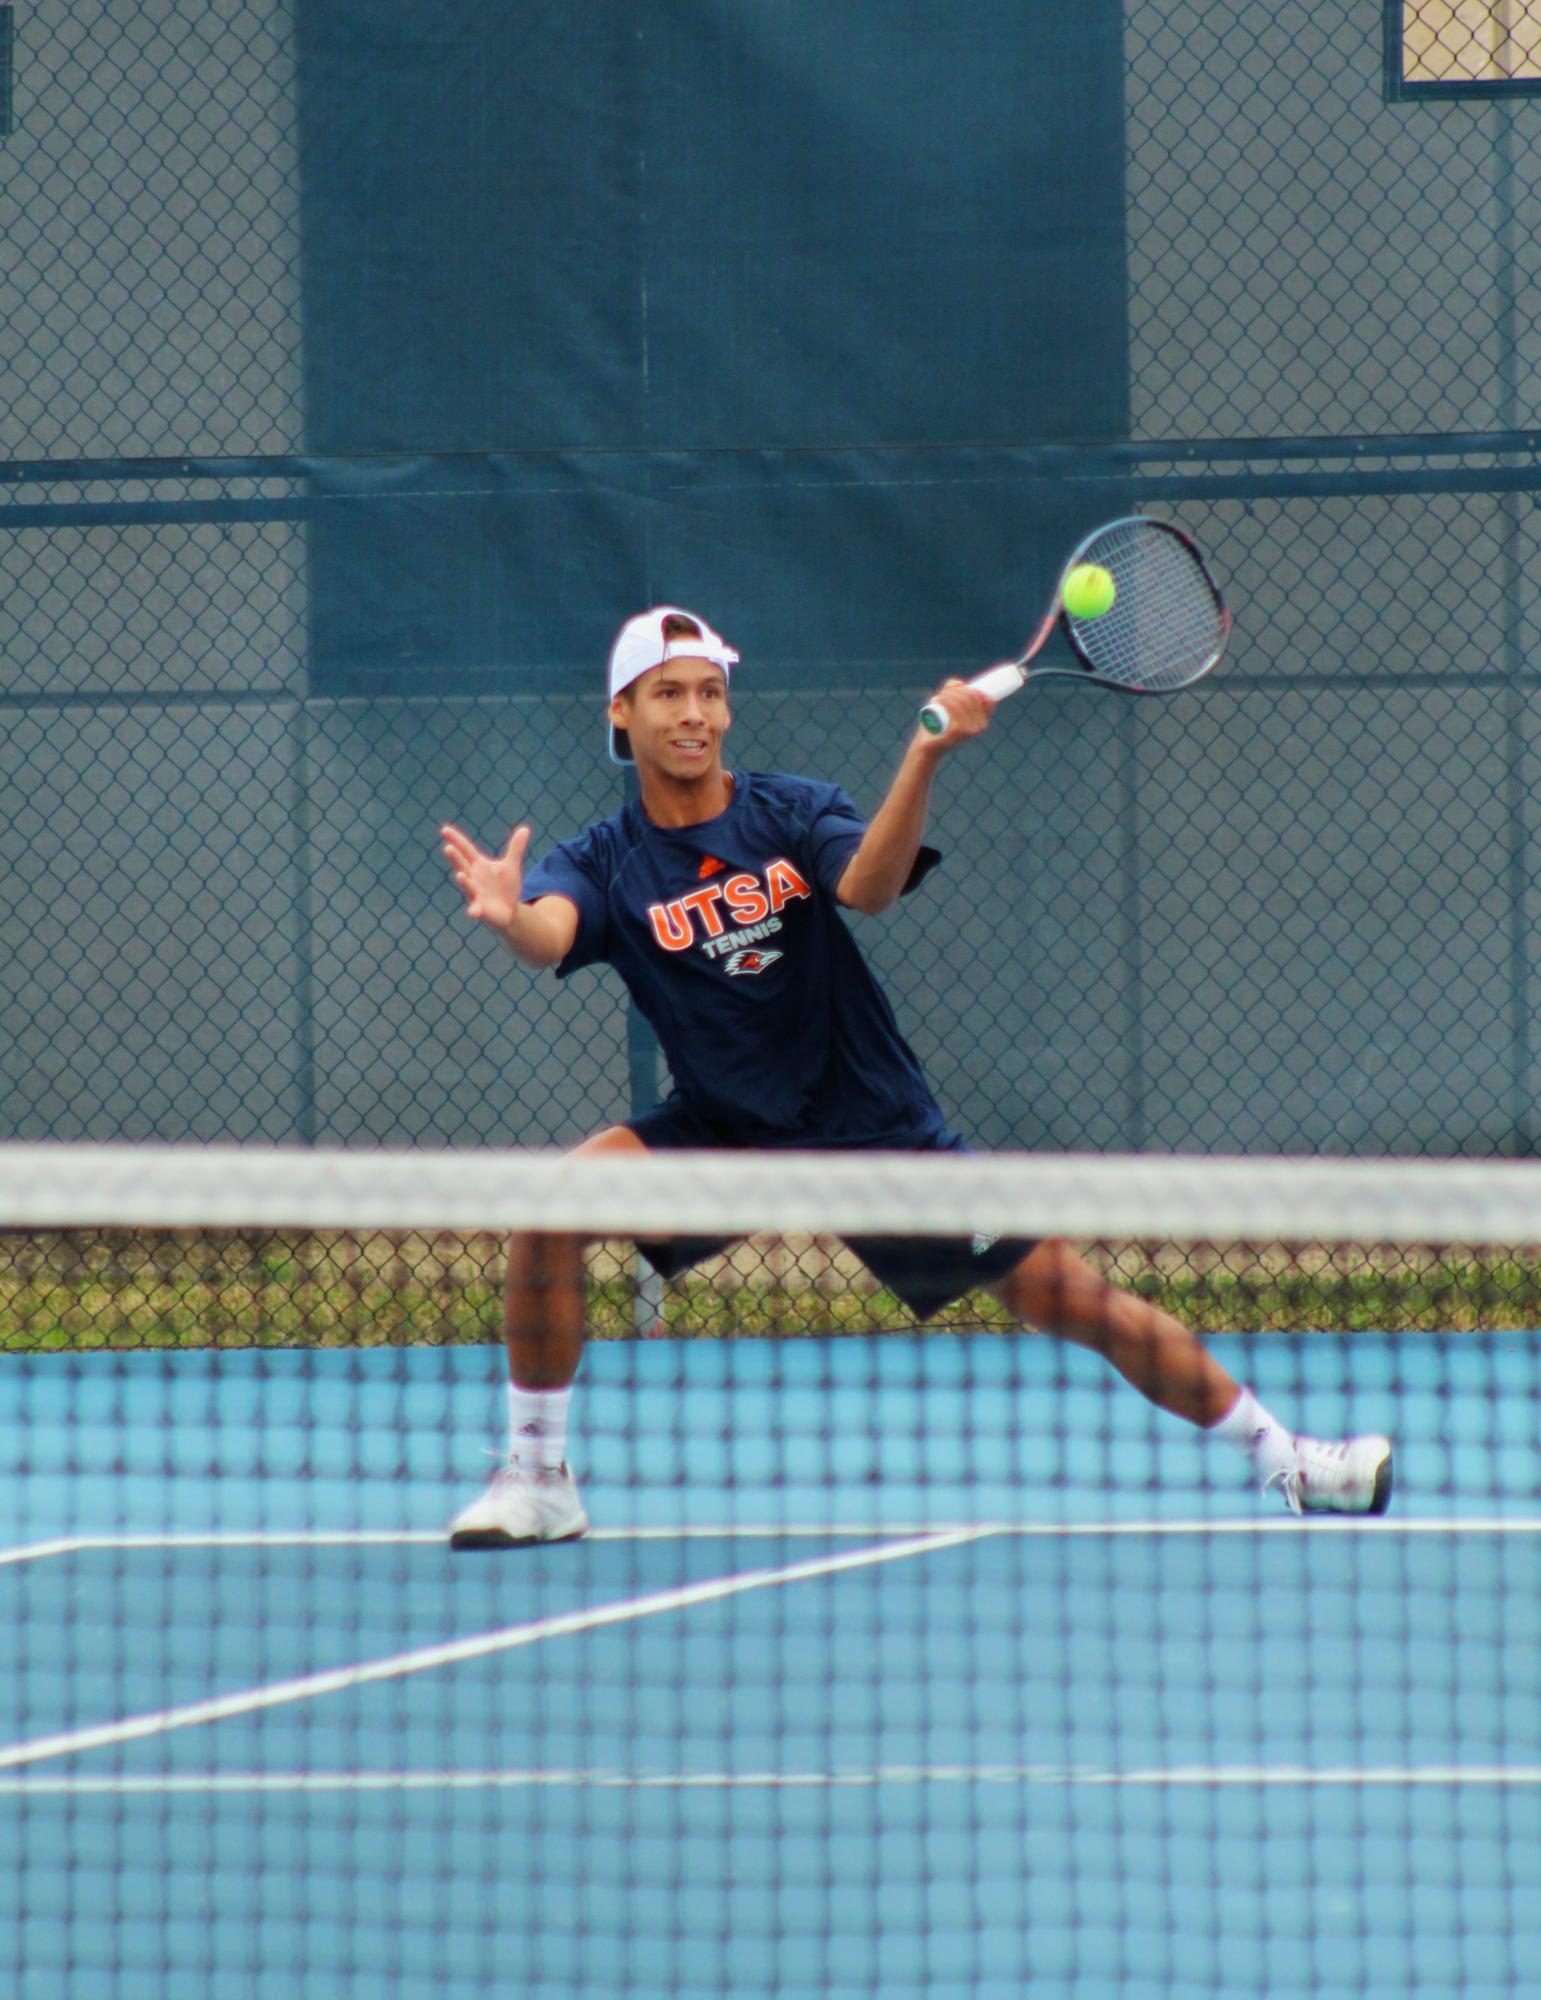 Alan Sanson volleys the ball over the net. Ethan Gullett / The Paisano